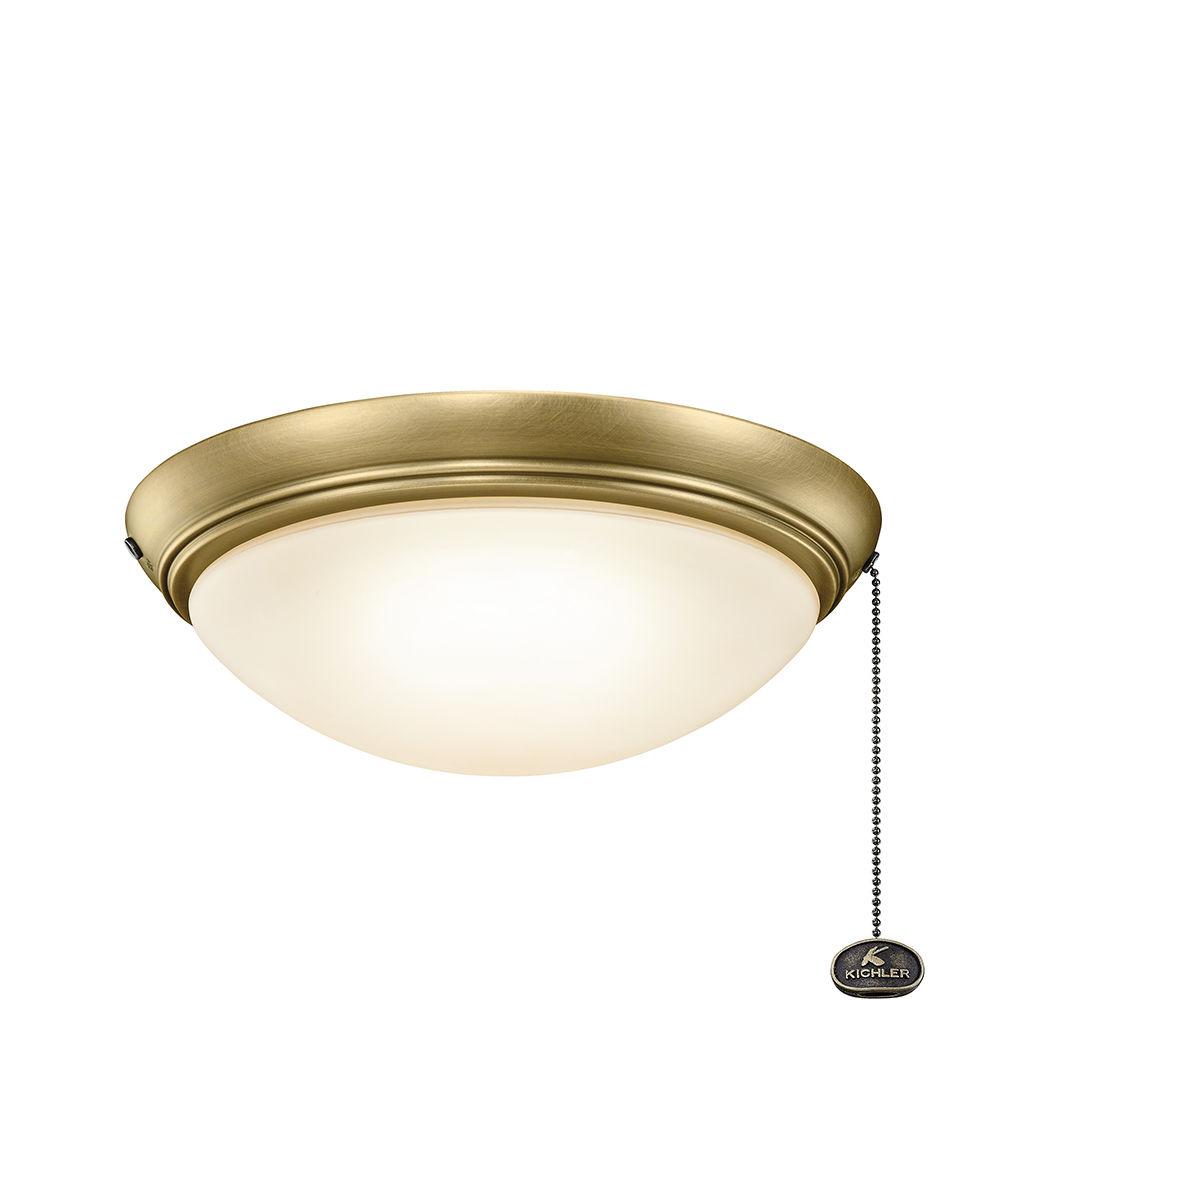 Low Profile Led Ceiling Fan Light Kit